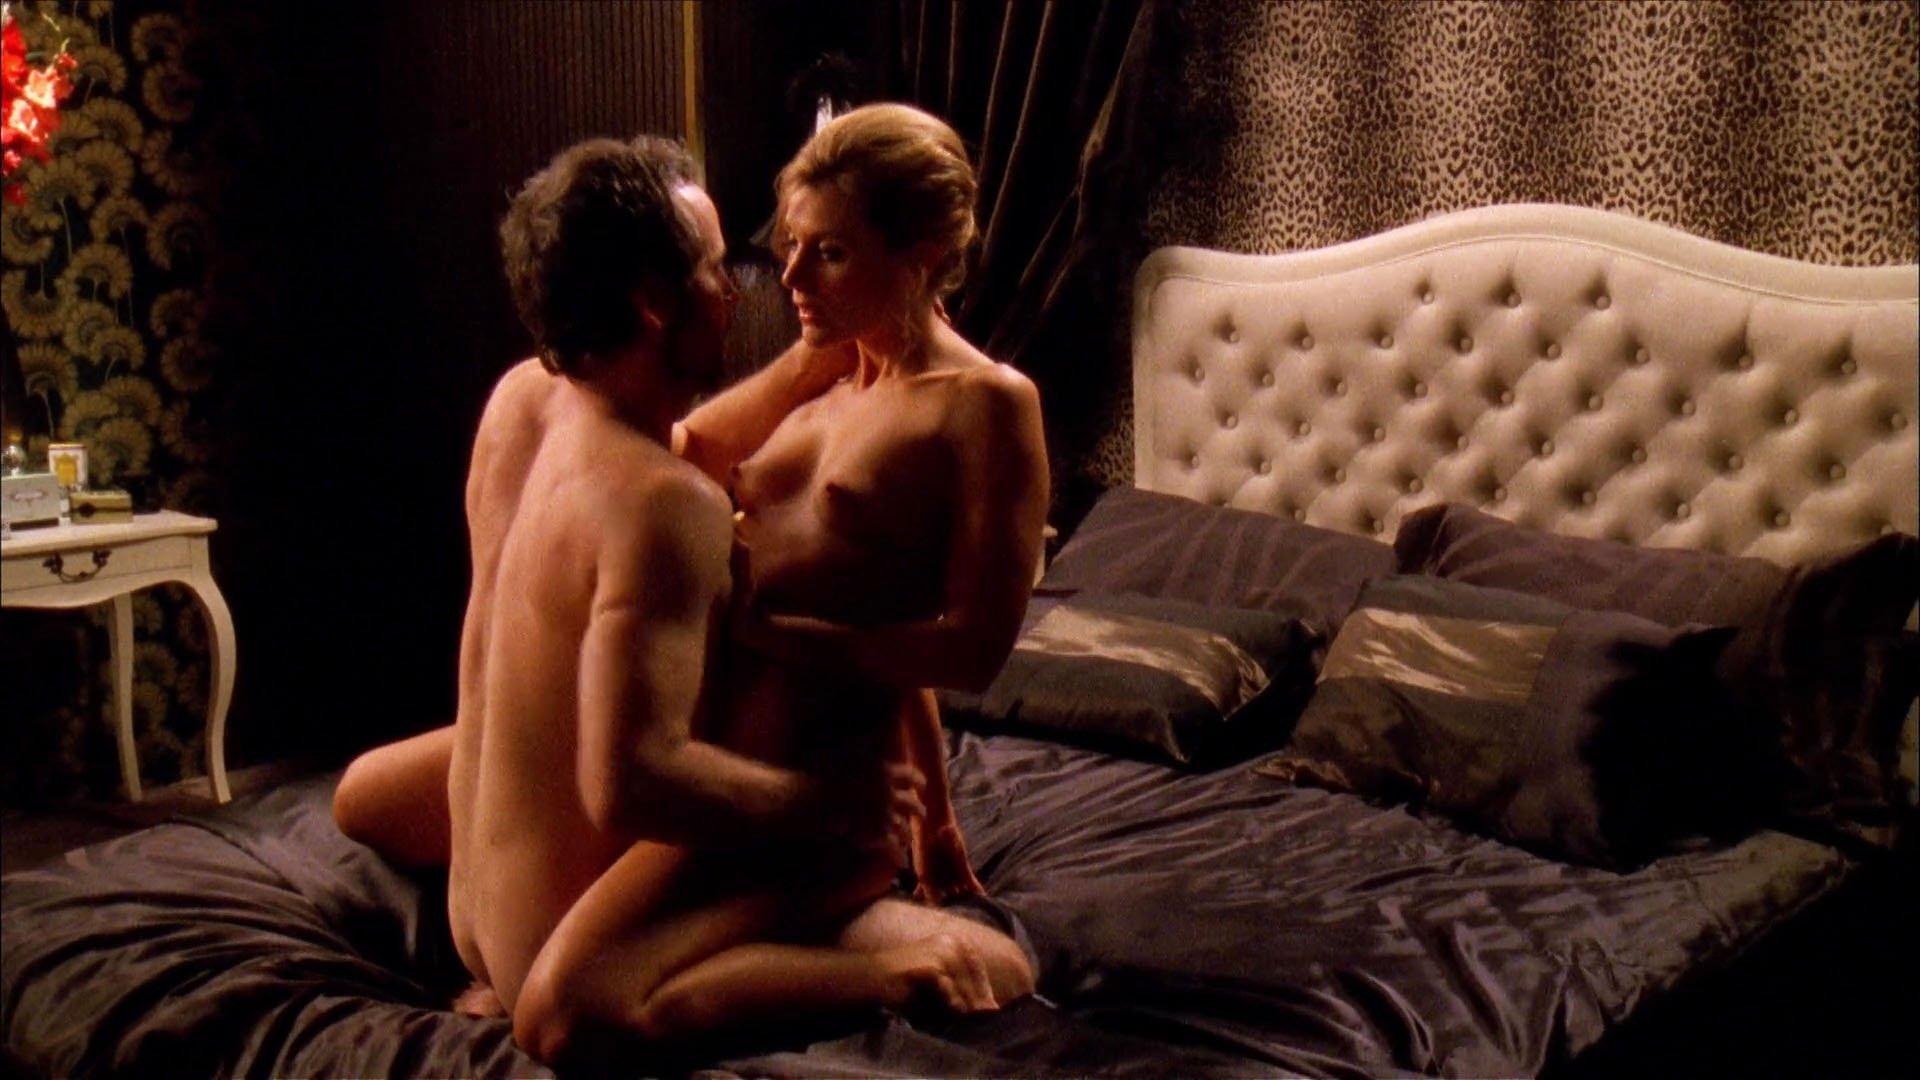 Diana Glenn nude - Satisfaction s02 (2009)